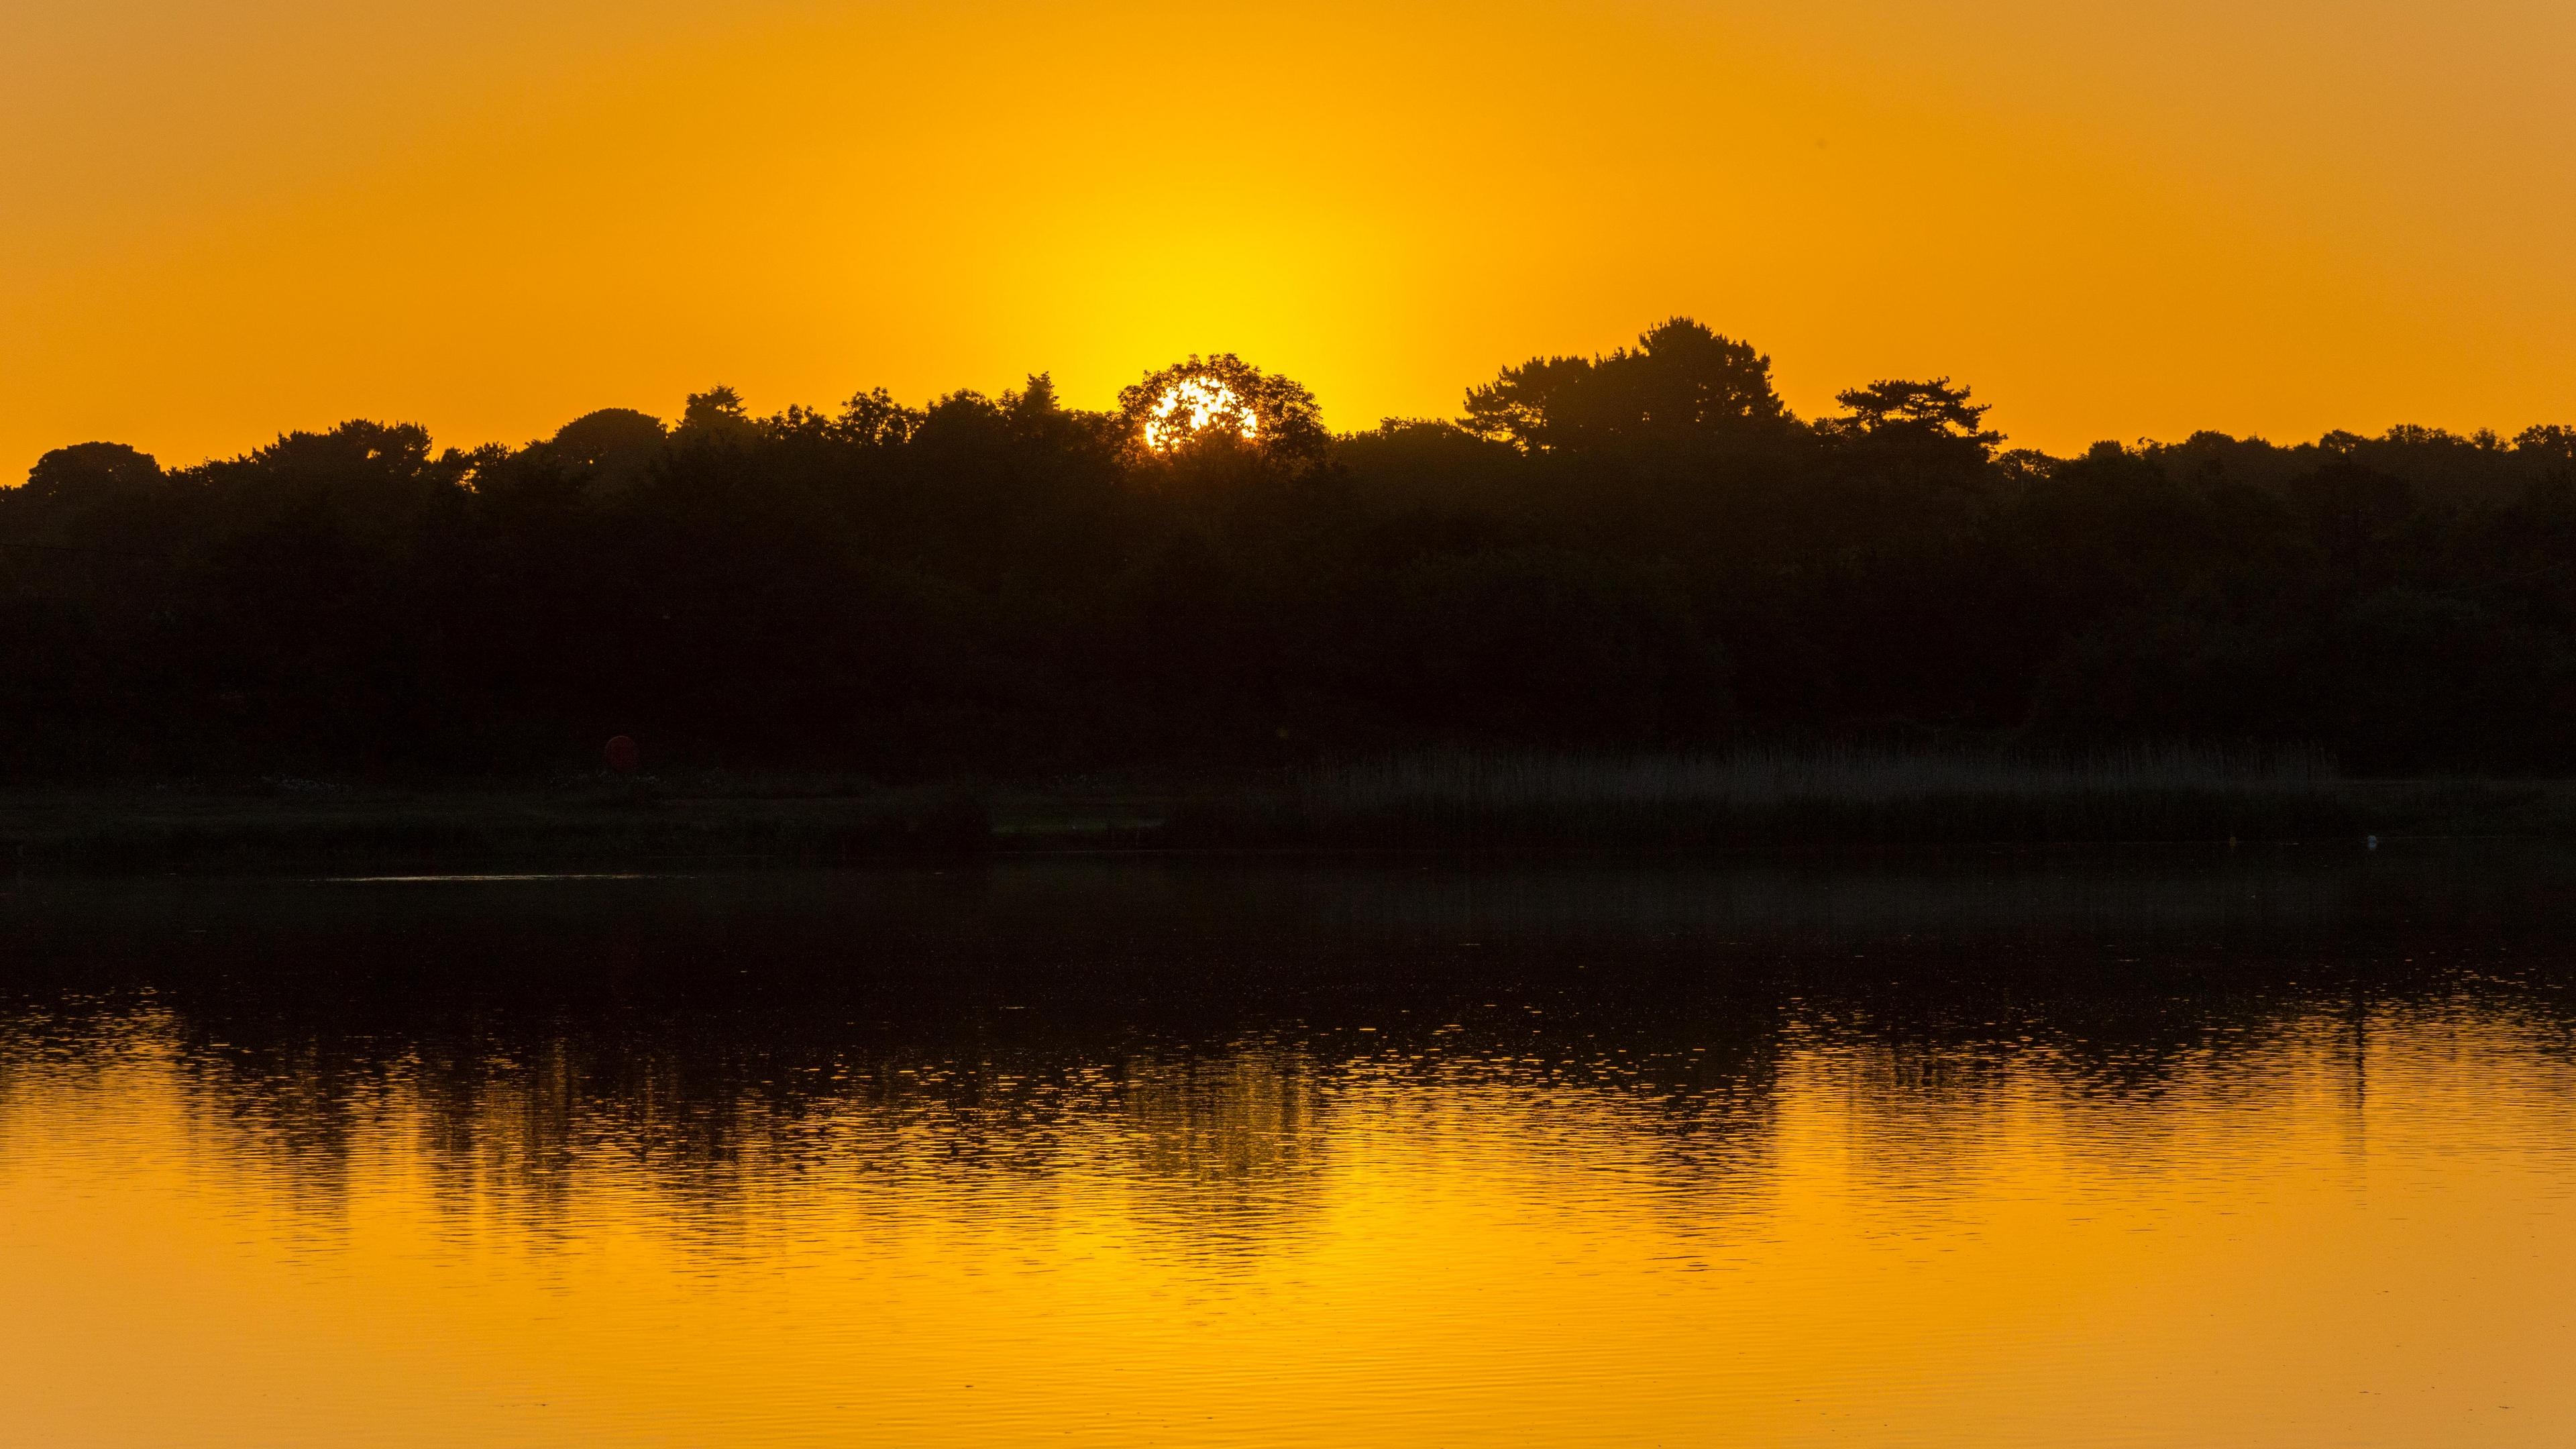 lake trees sunset reflection sky ripples 4k 1541117264 - lake, trees, sunset, reflection, sky, ripples 4k - Trees, sunset, Lake